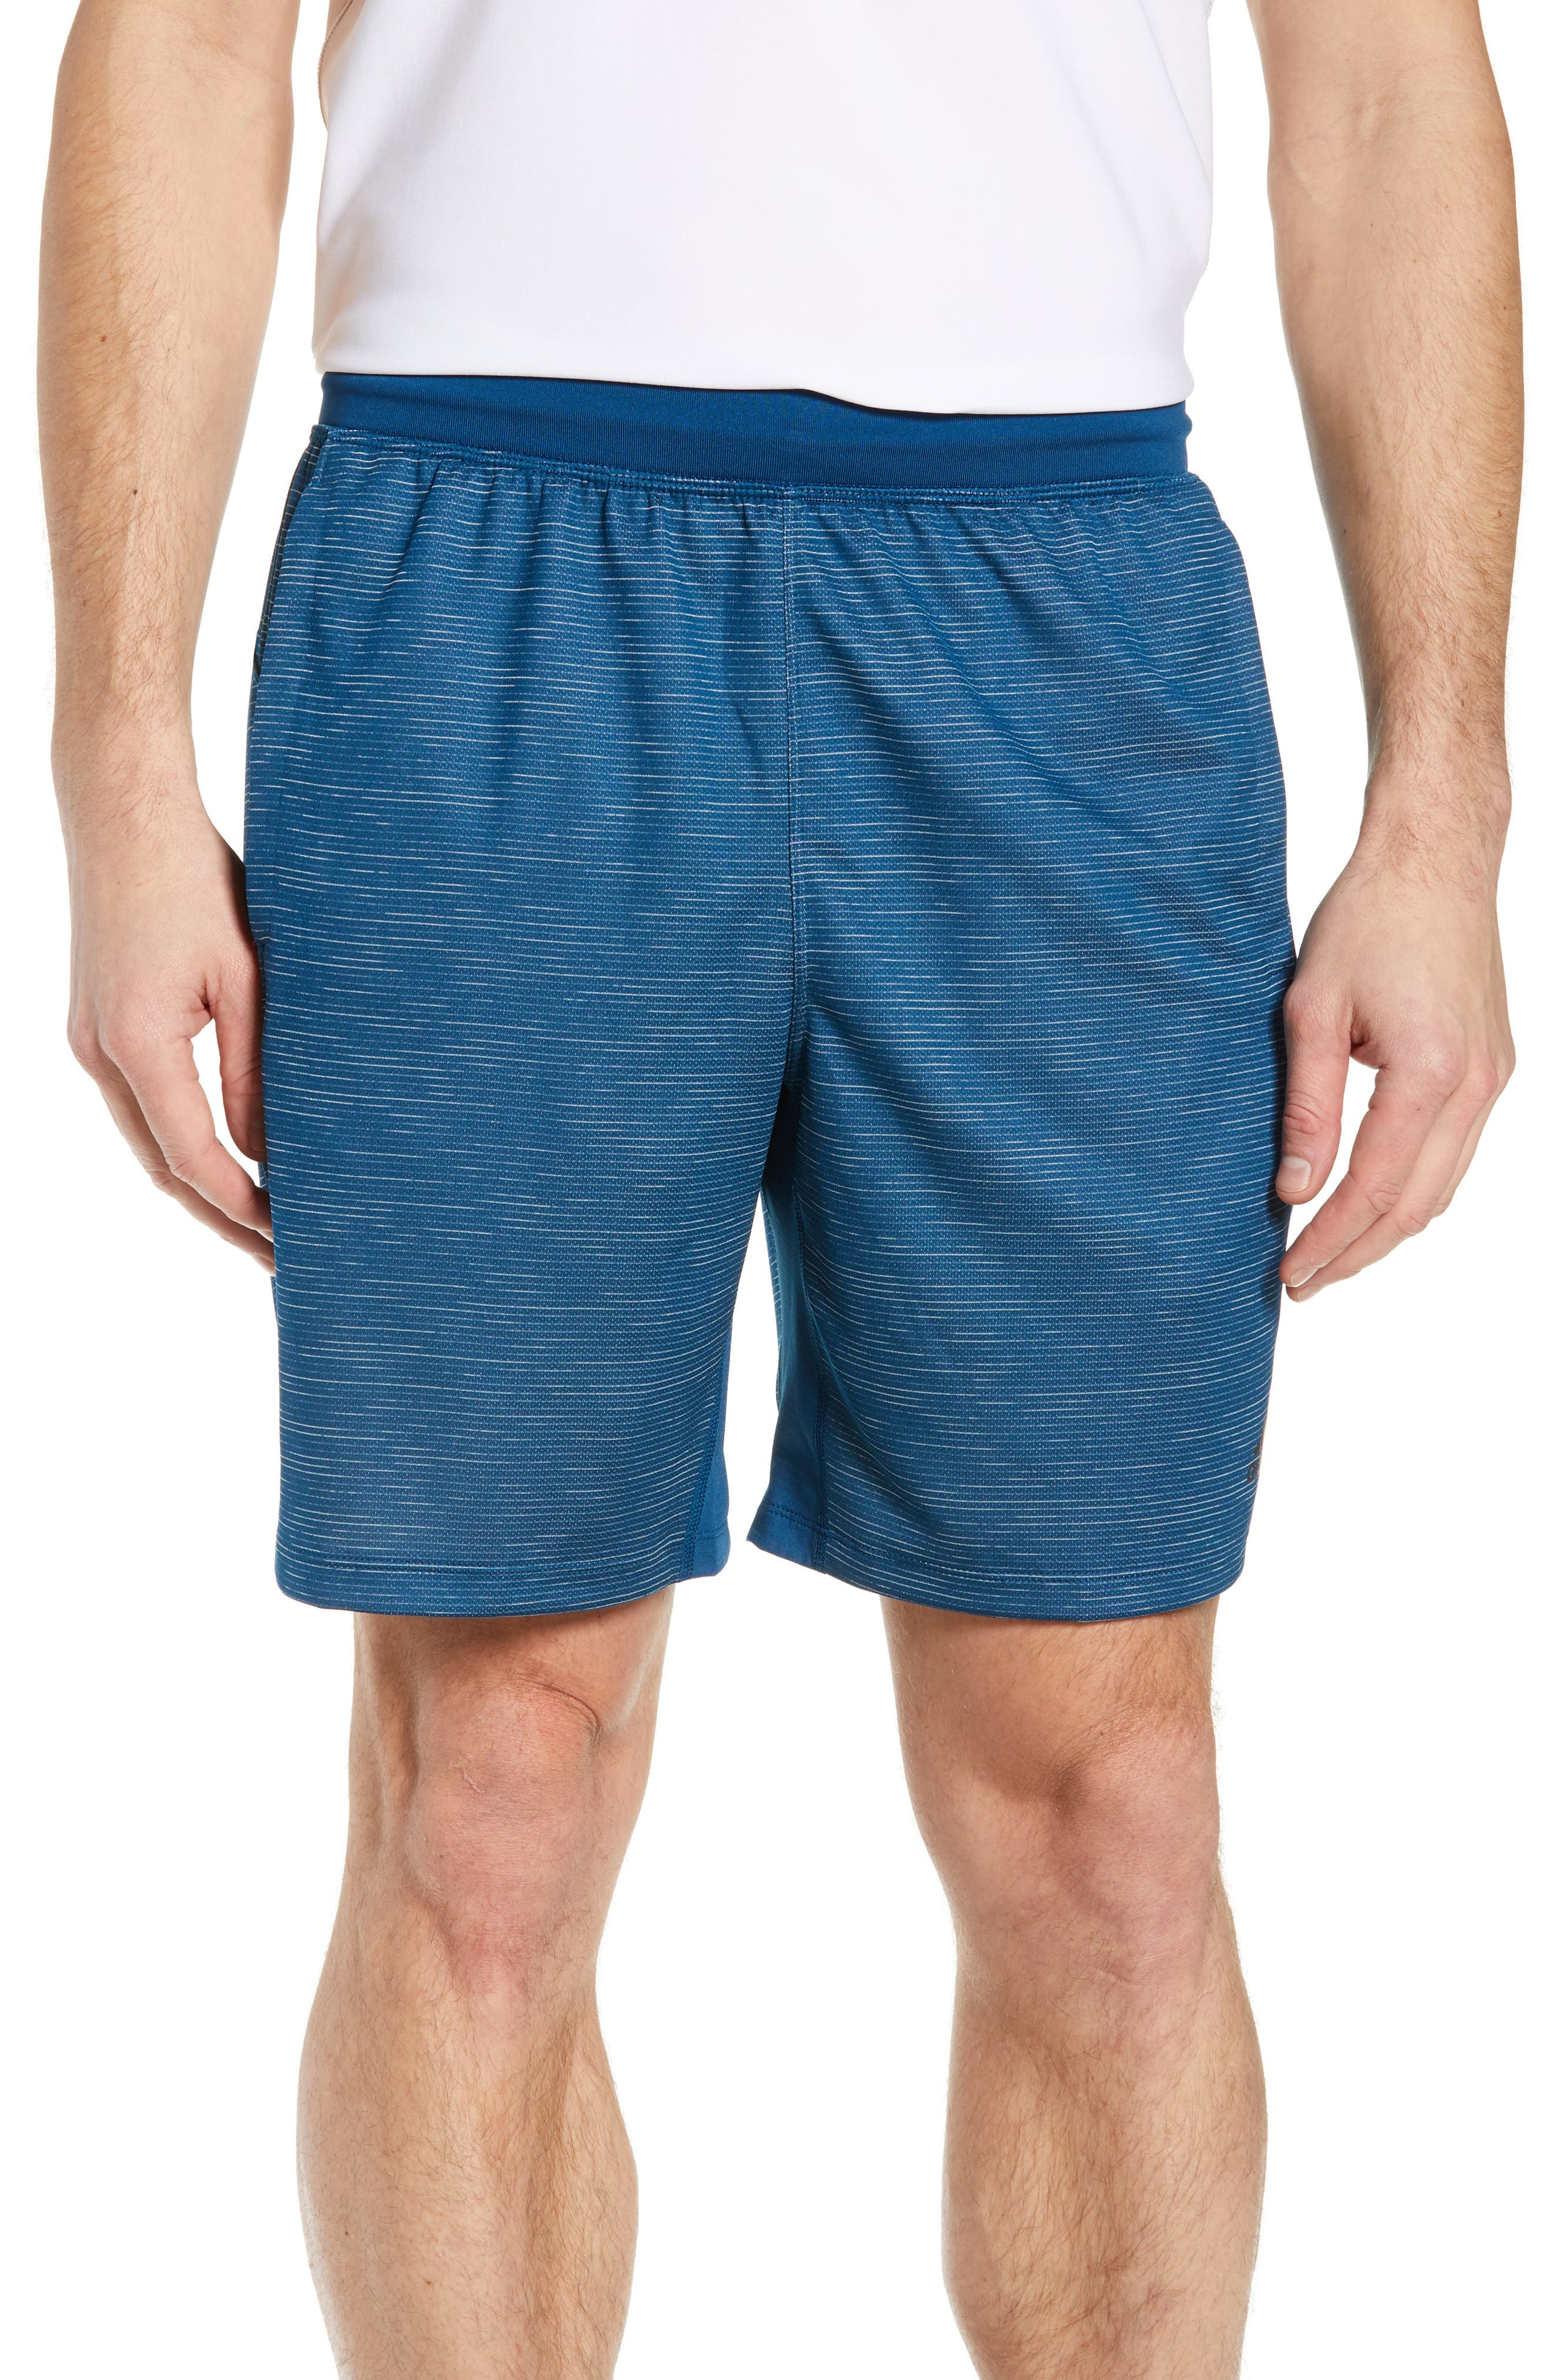 Adidas Knit Shorts, Blue